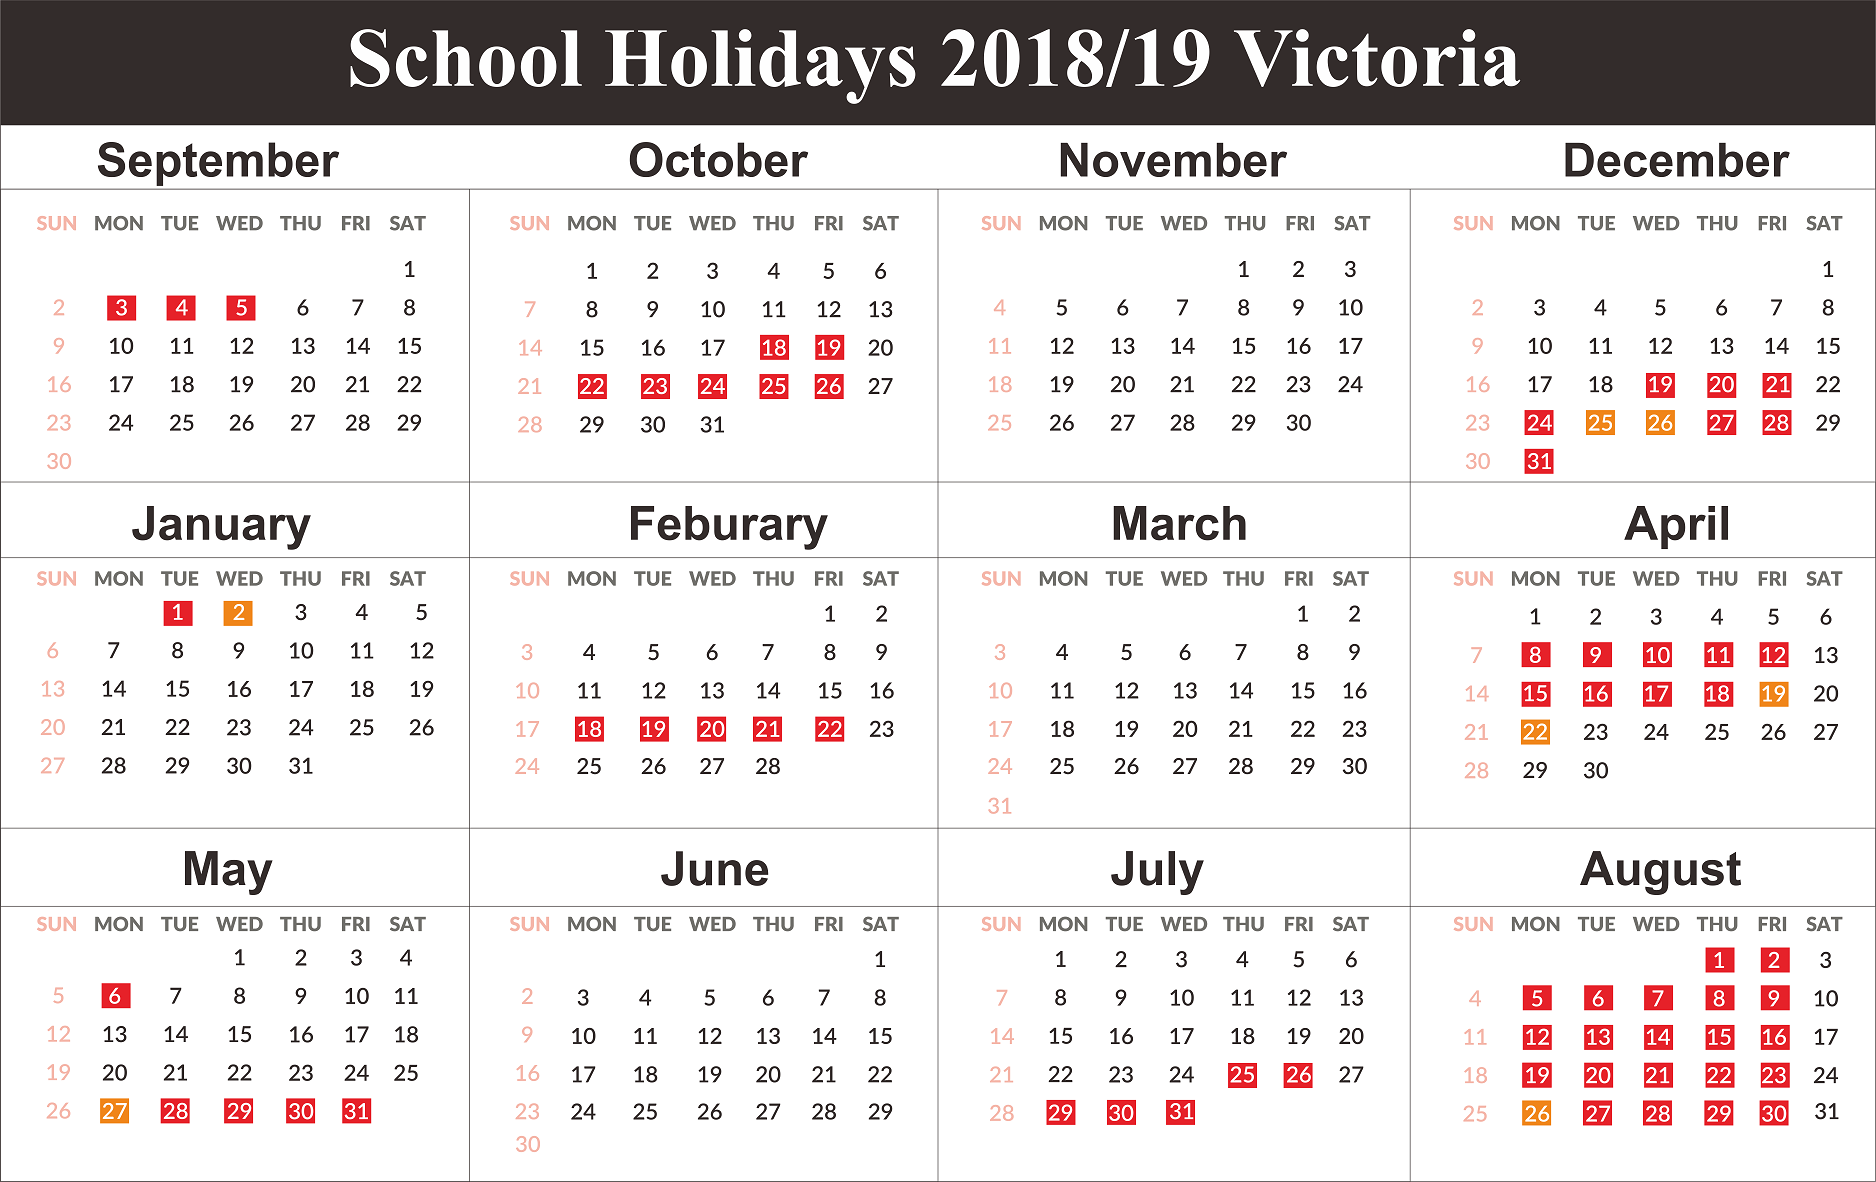 Victoria School Holidays Dates 2019